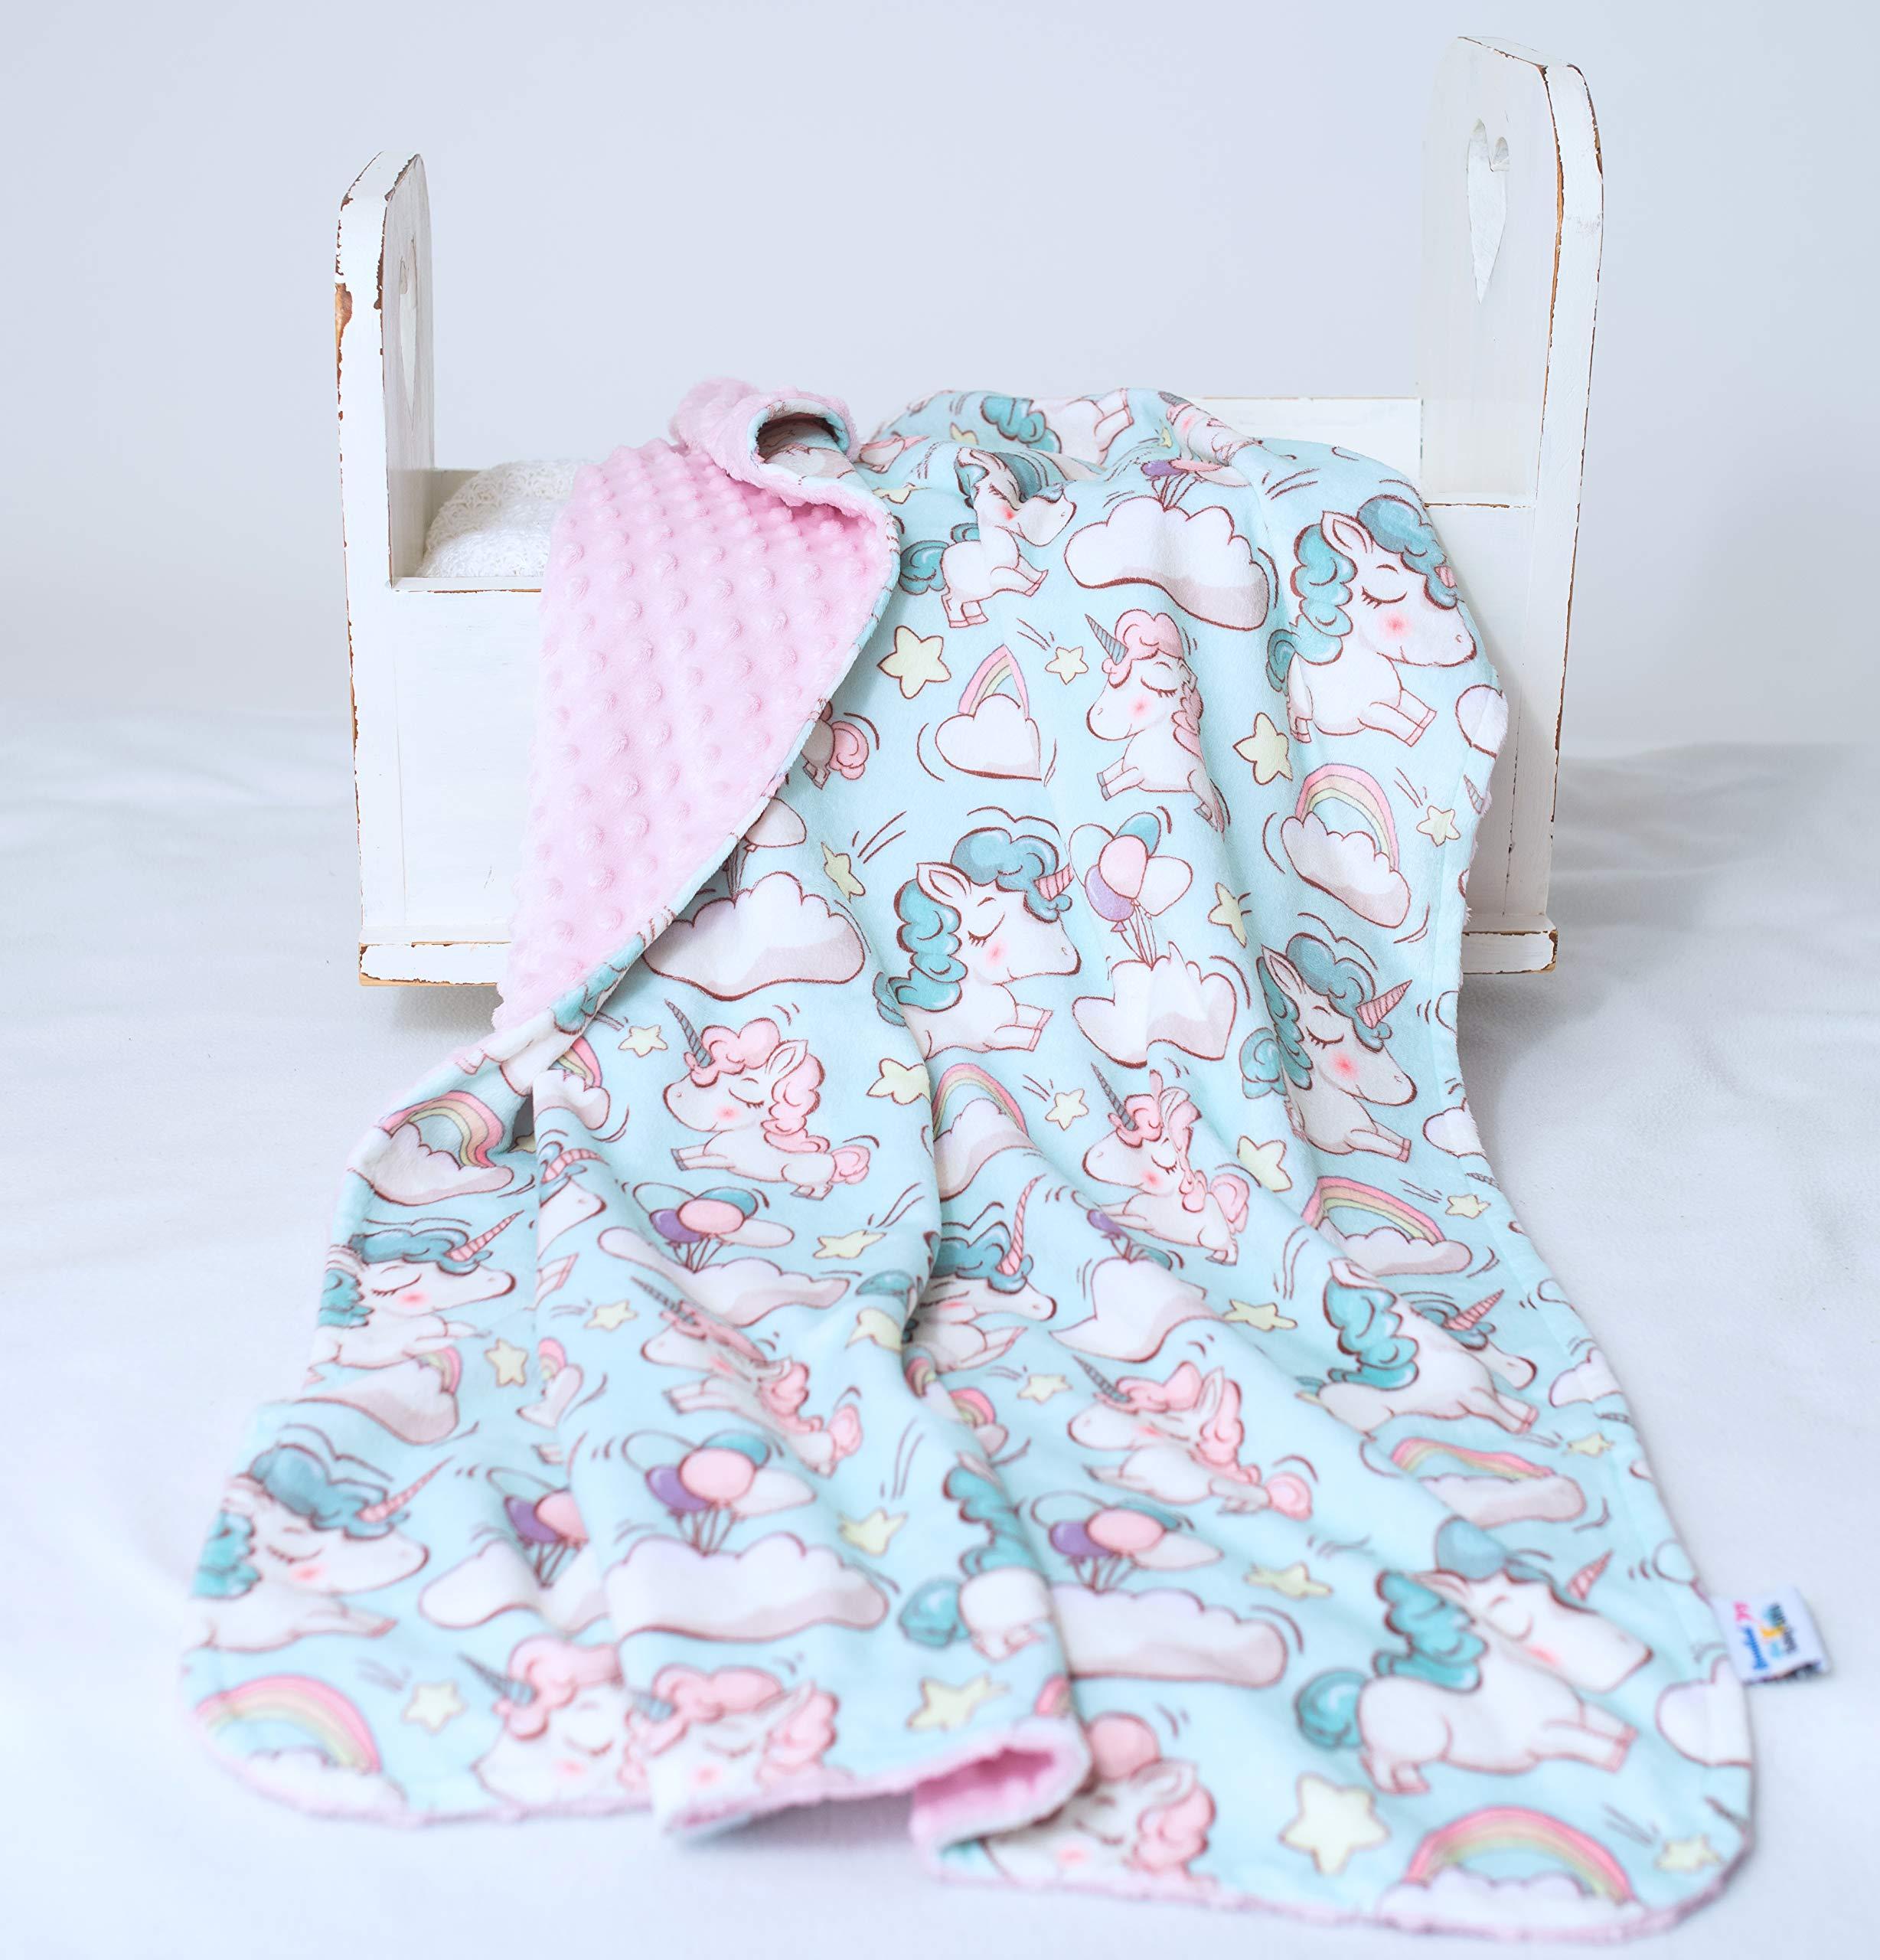 Bundled Joy Baby Gifts – Premium Soft Plush Lightweight Minky Dot Toddler Baby Newborn Blanket 30″x40″ Girls Unicorn Pink